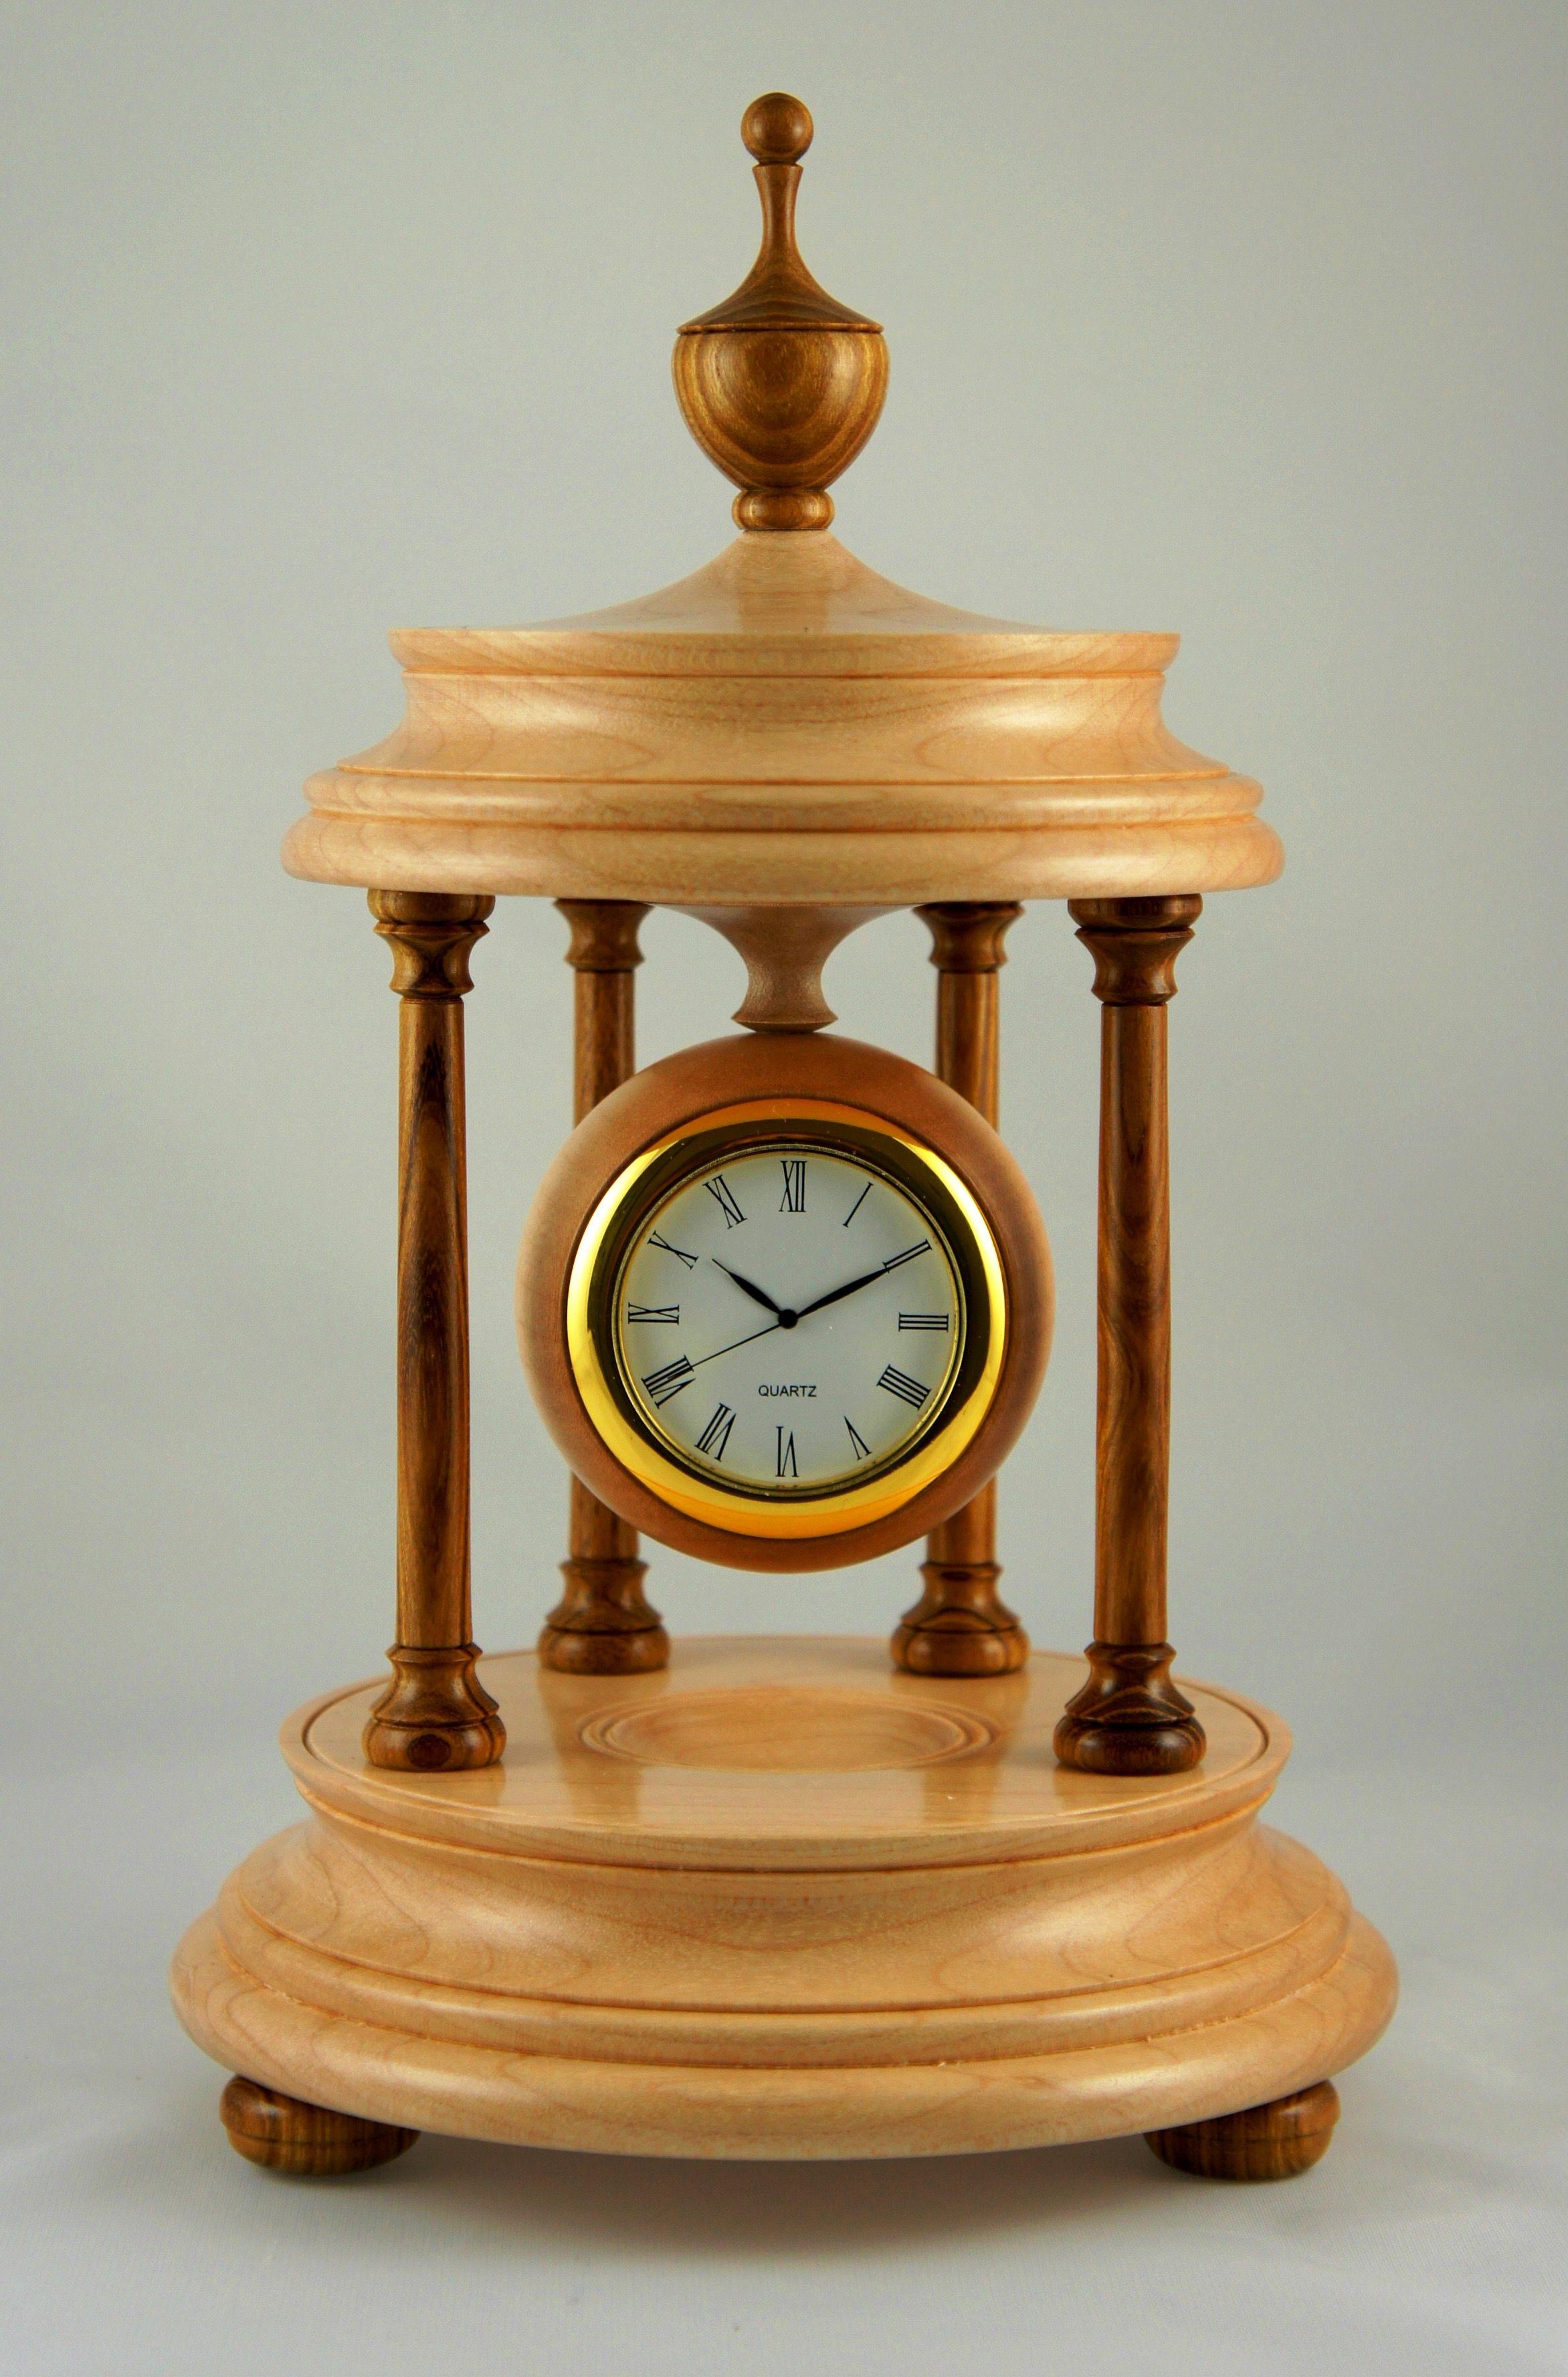 Davinci furniture perancis furniture standing clock mirror contact us - Grandfather Clock